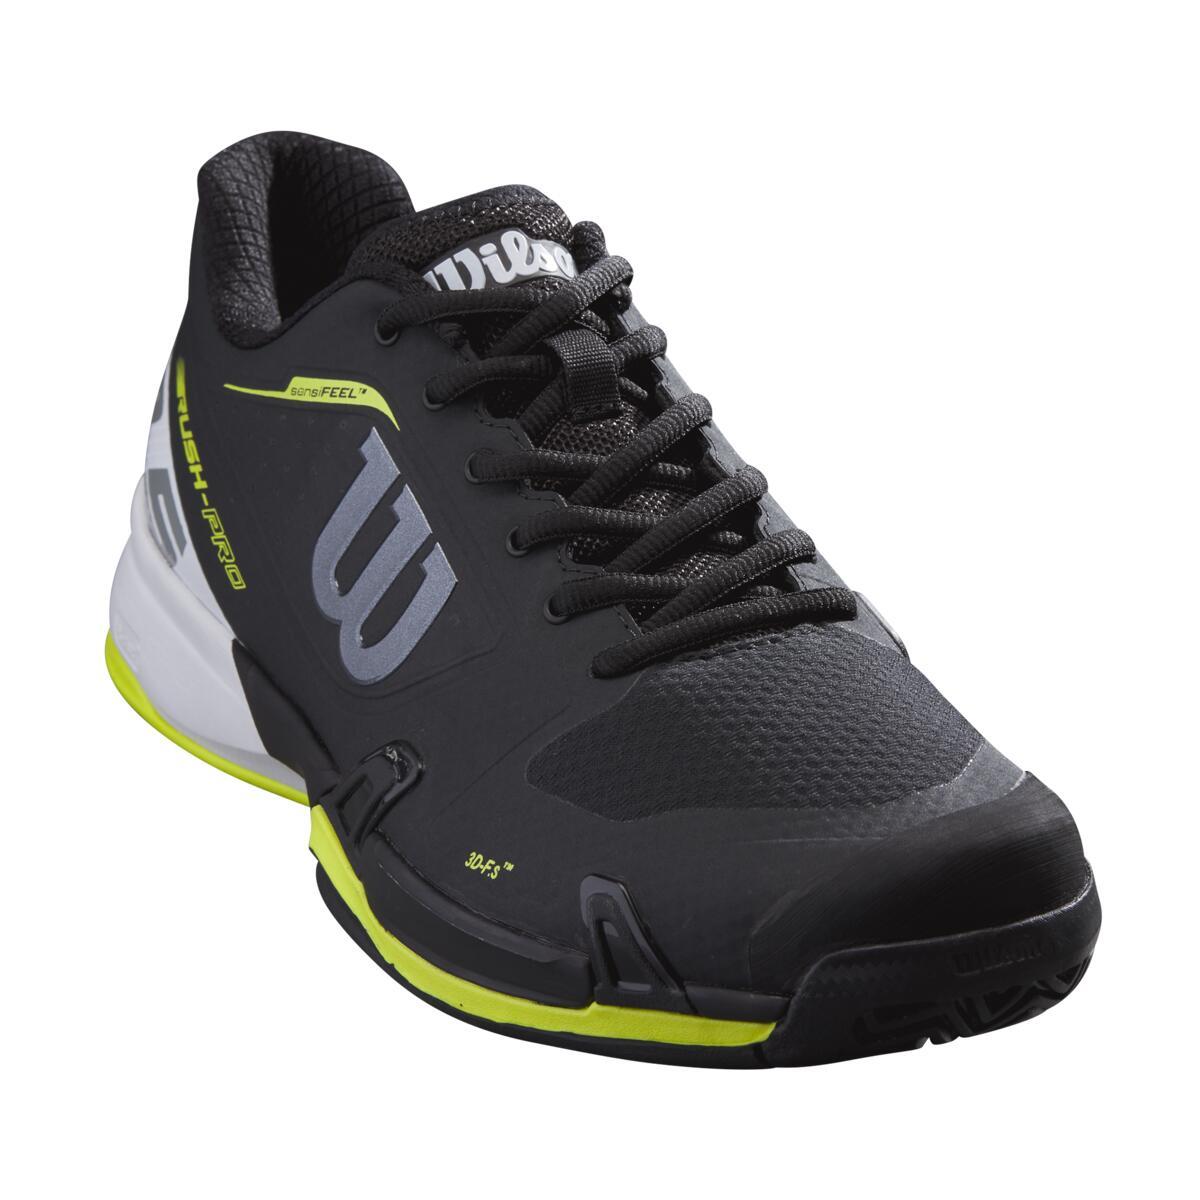 Wilson Rush Pro 2.5 AC Mens Tennis Shoes – Black/White/Lime Popsicle